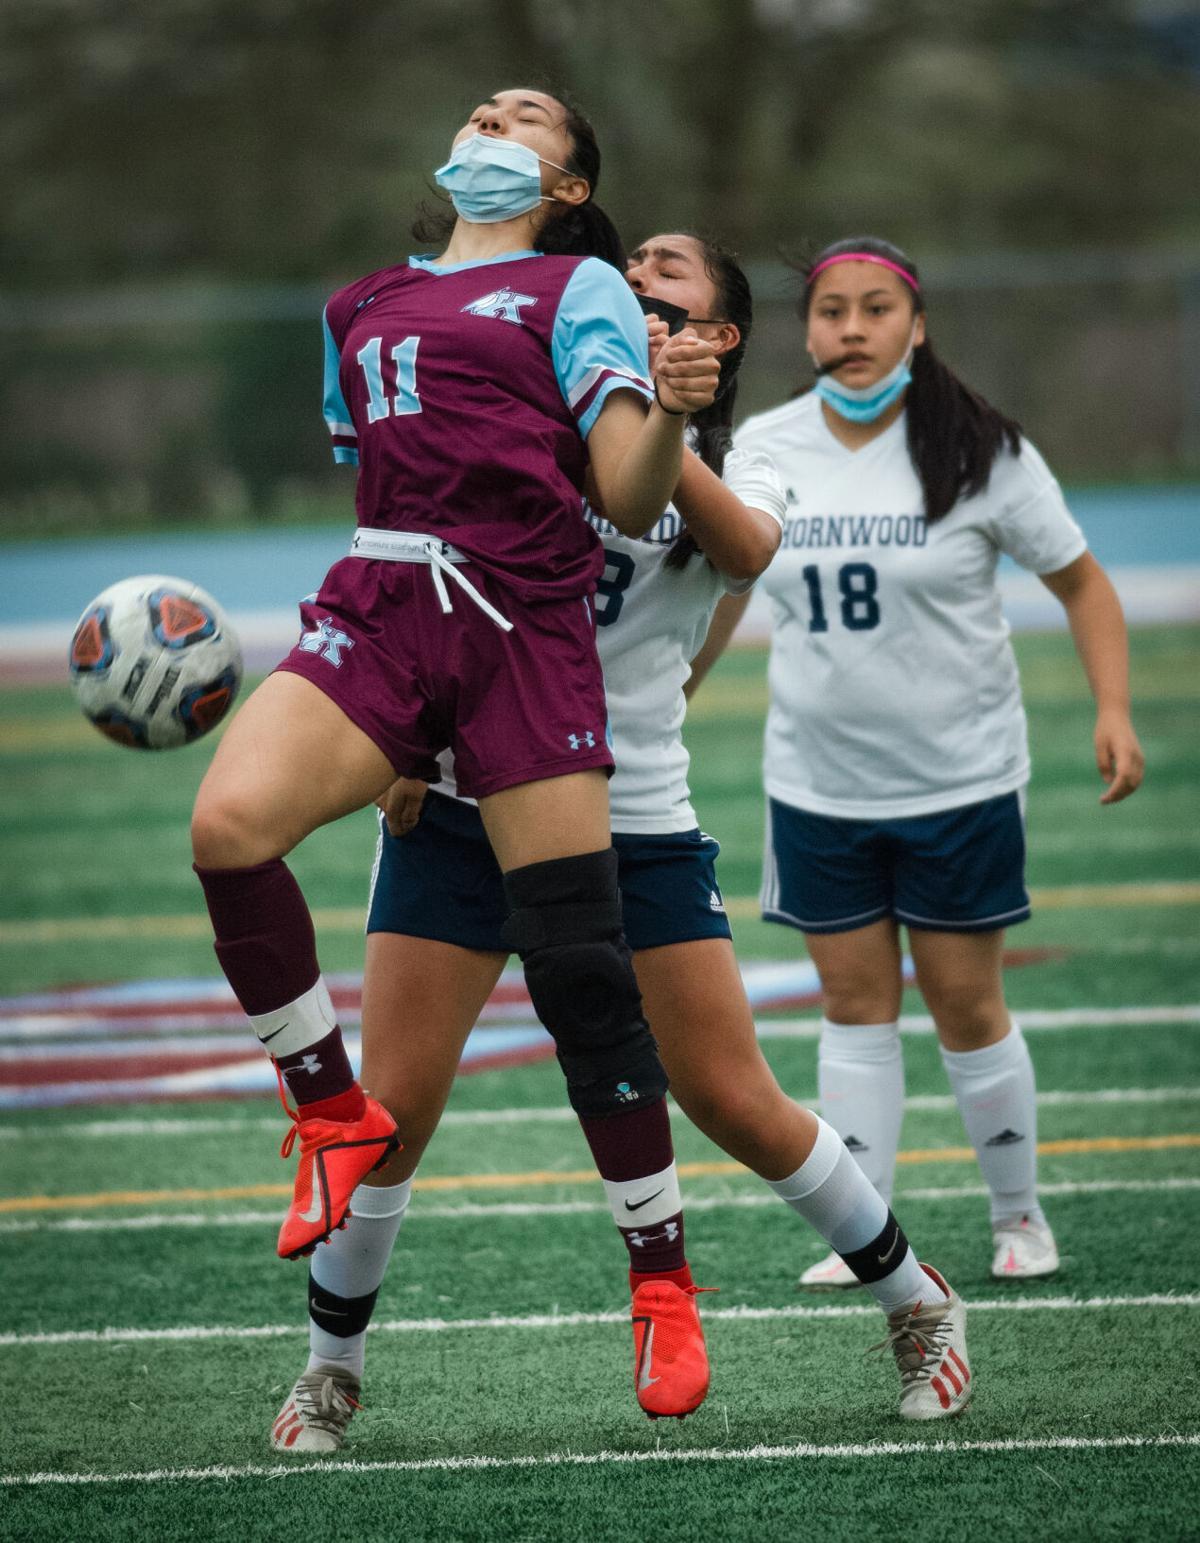 Kankakee/Thornwood Girls Soccer